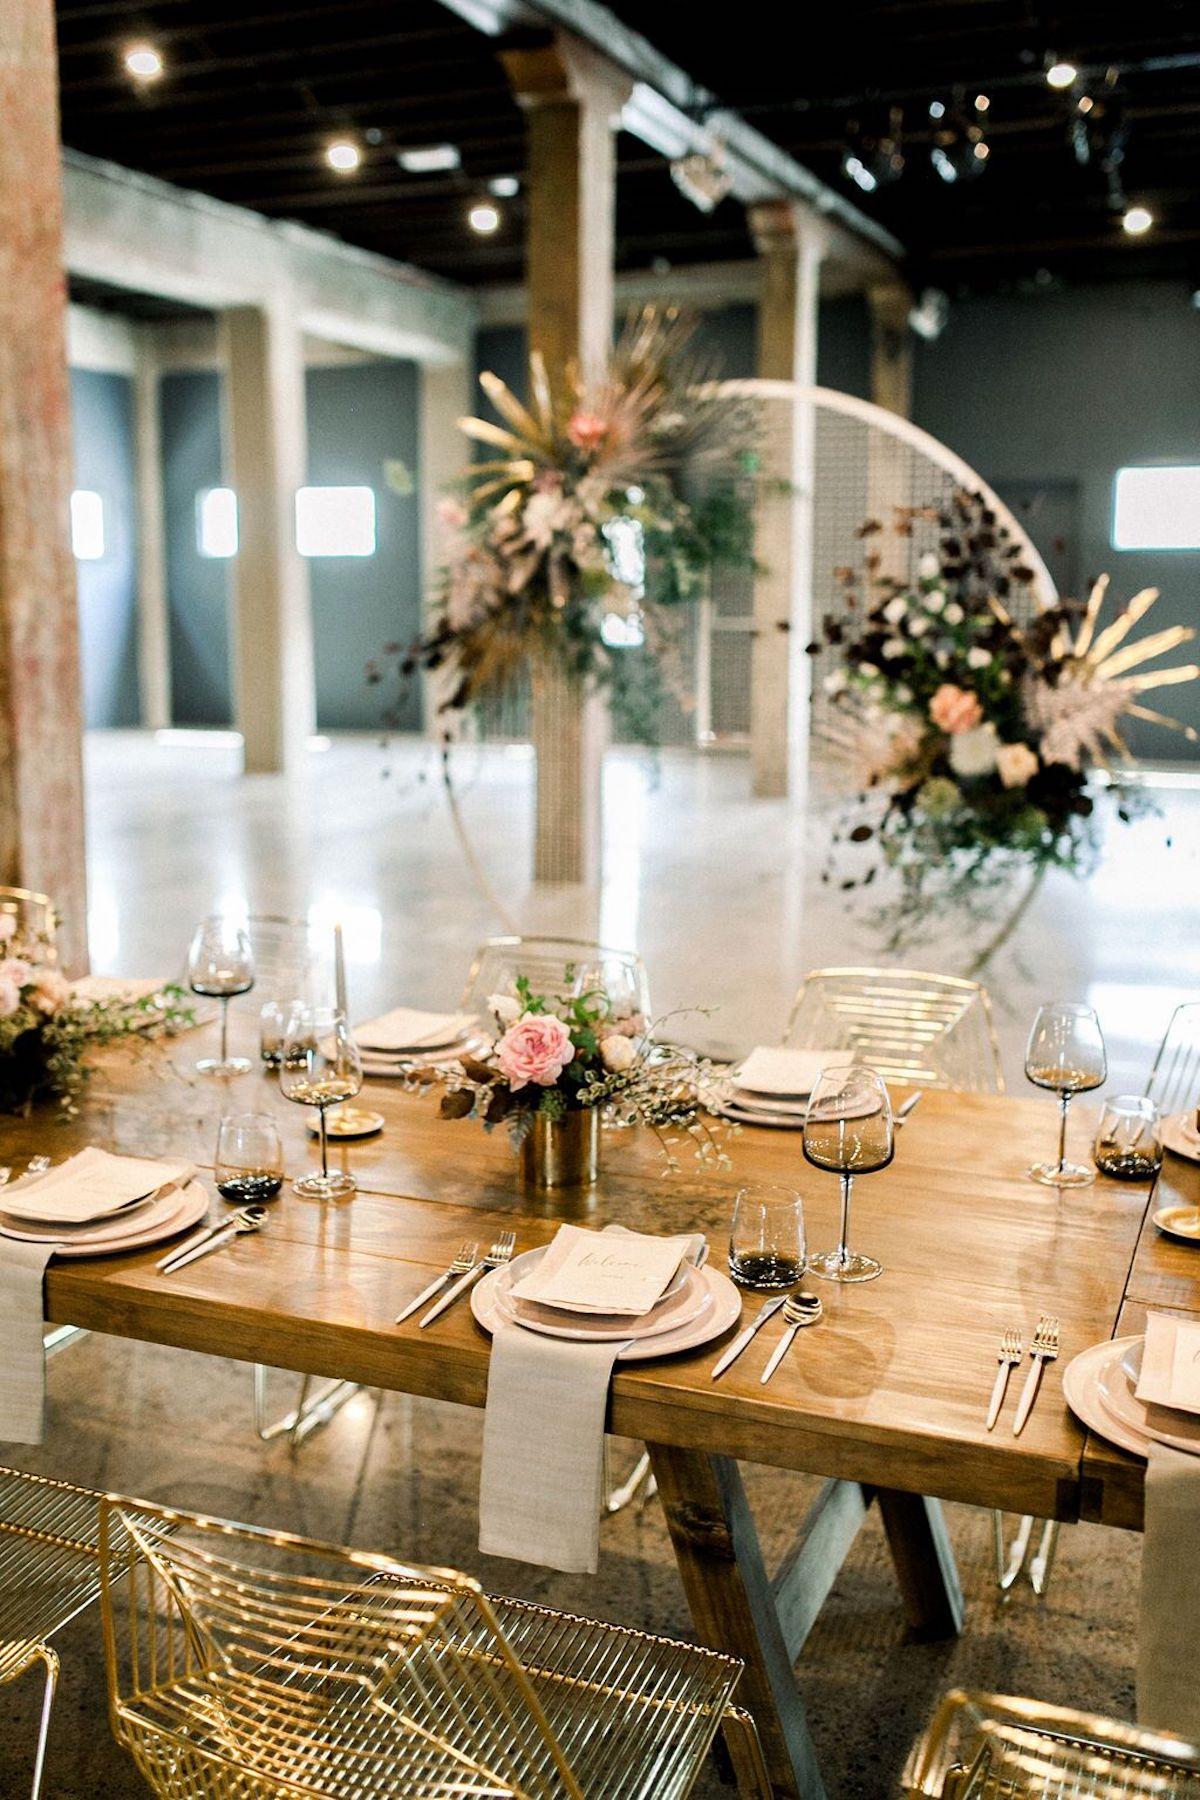 Linen Napkin Hire Wedding Styling Inspiration19.jpeg